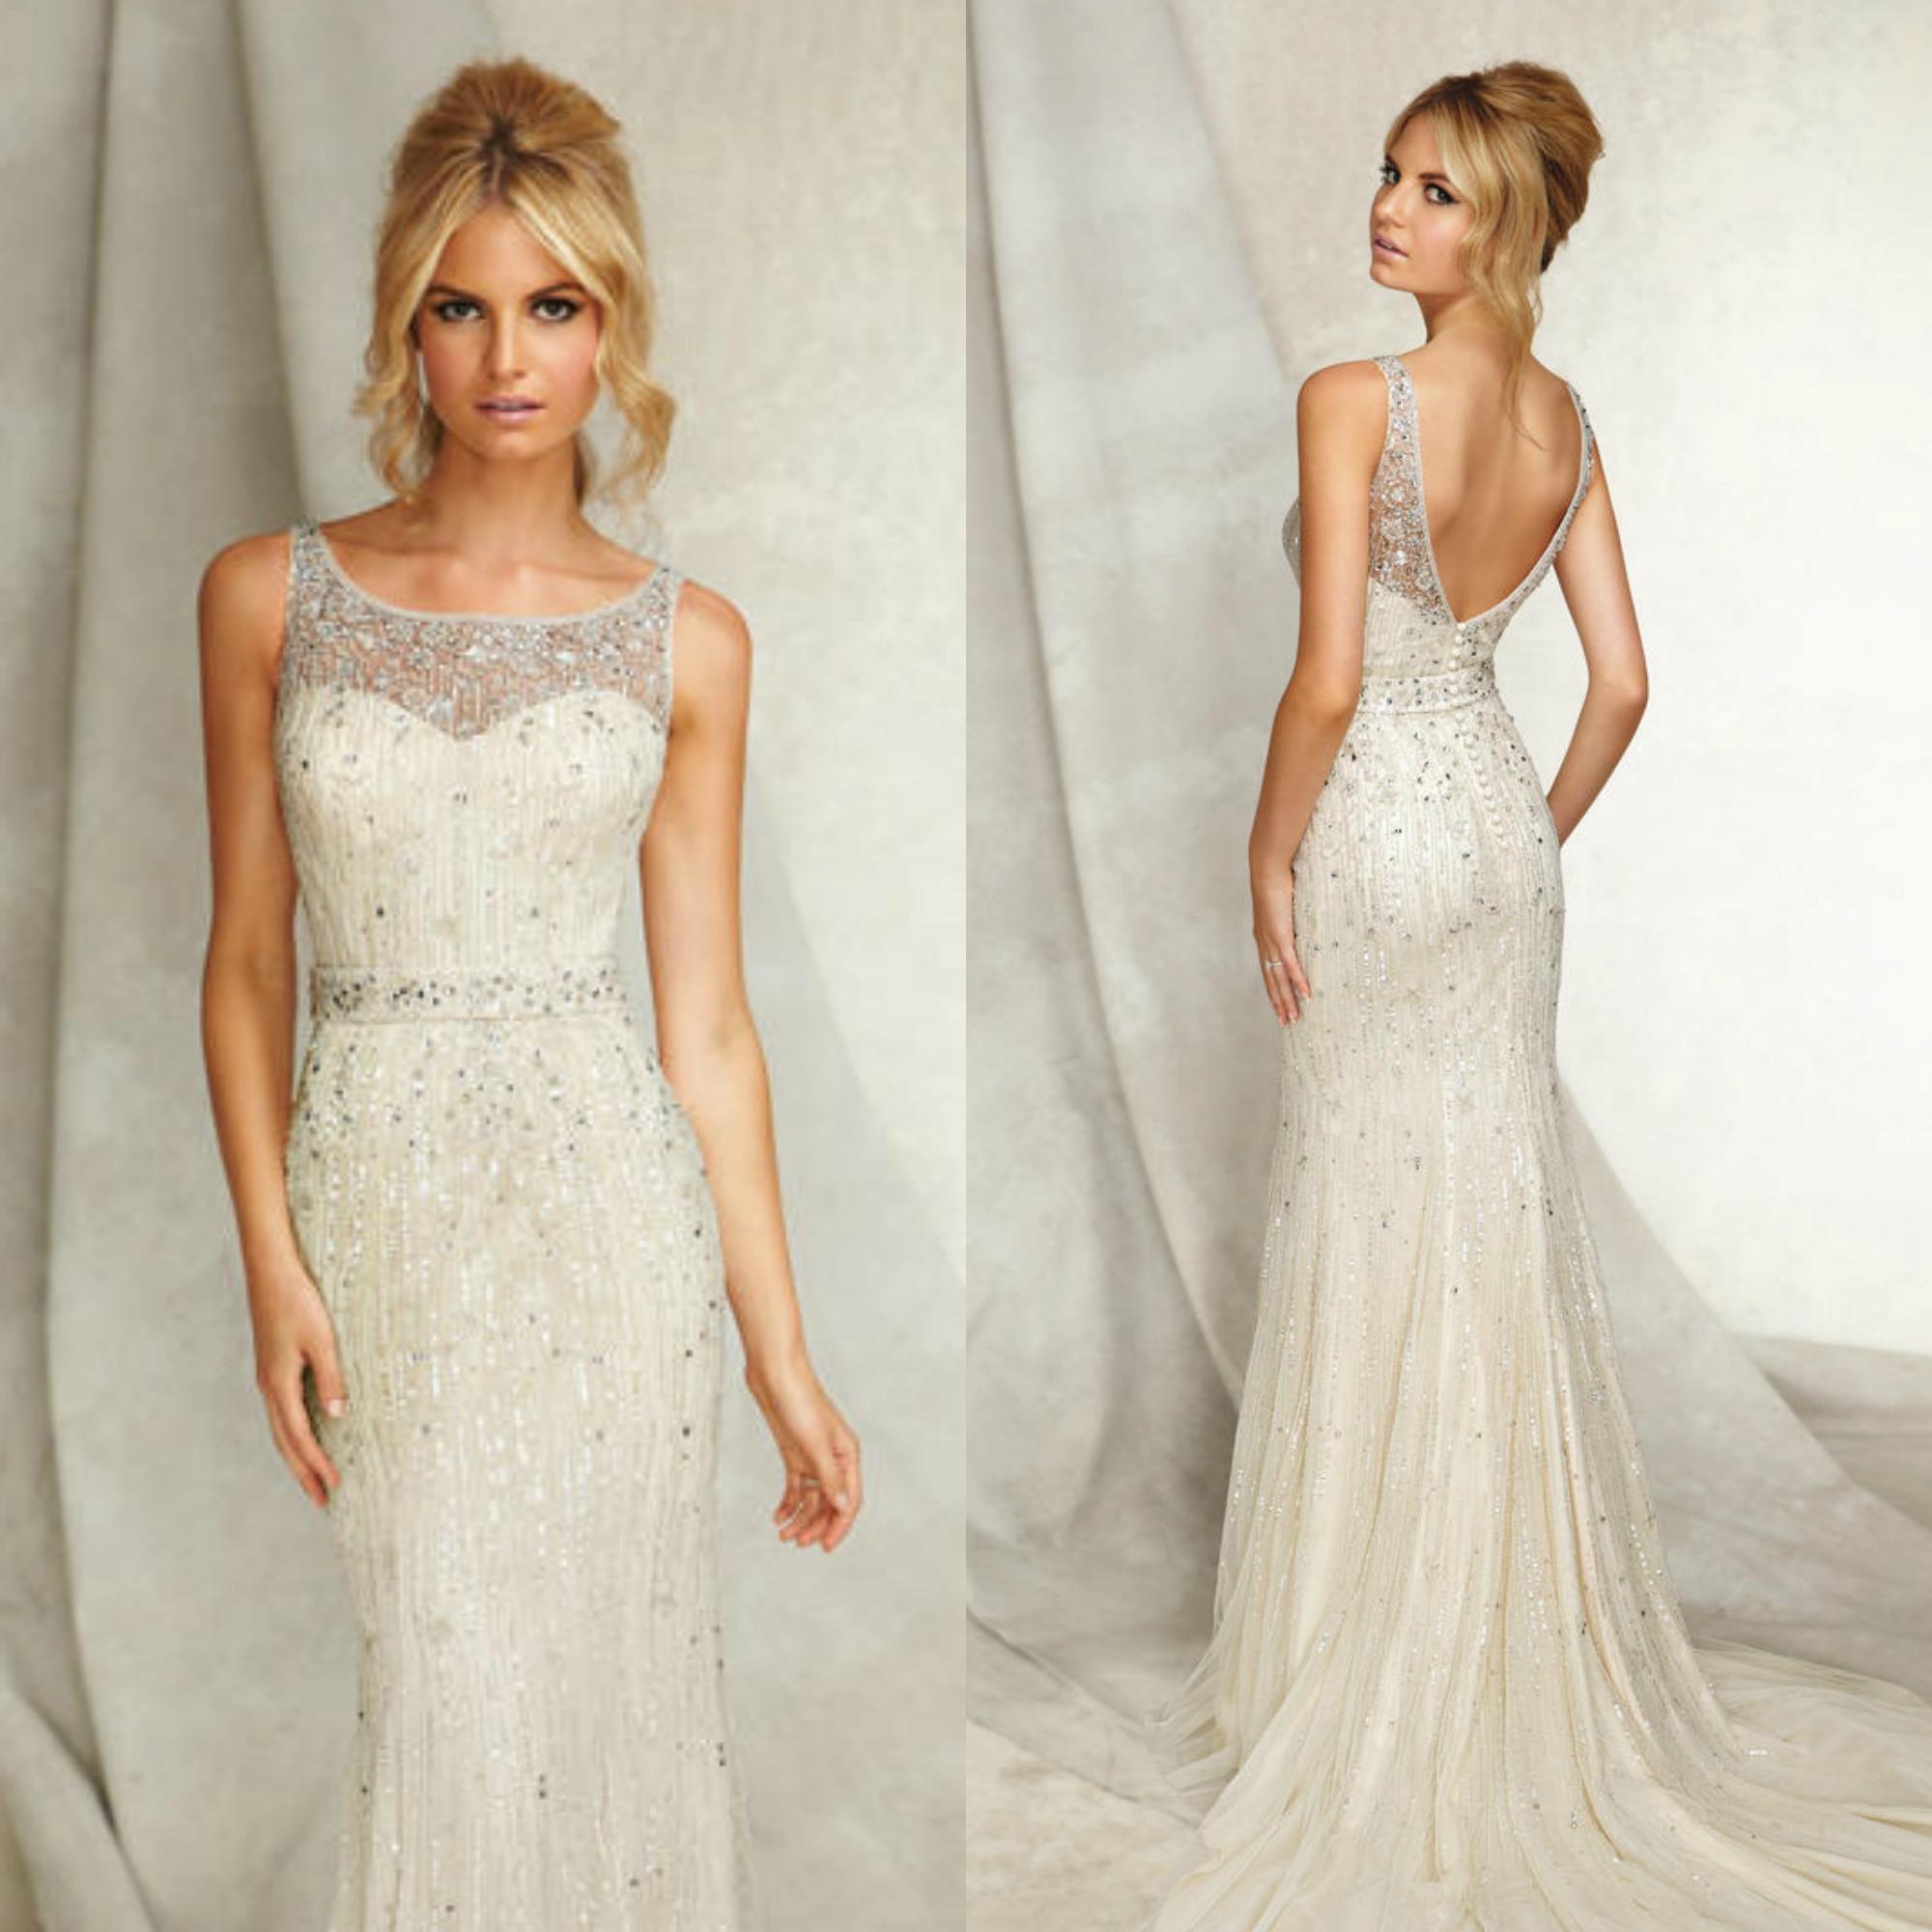 65 Perfect Low Back Wedding Dresses | The Best Wedding Dresses